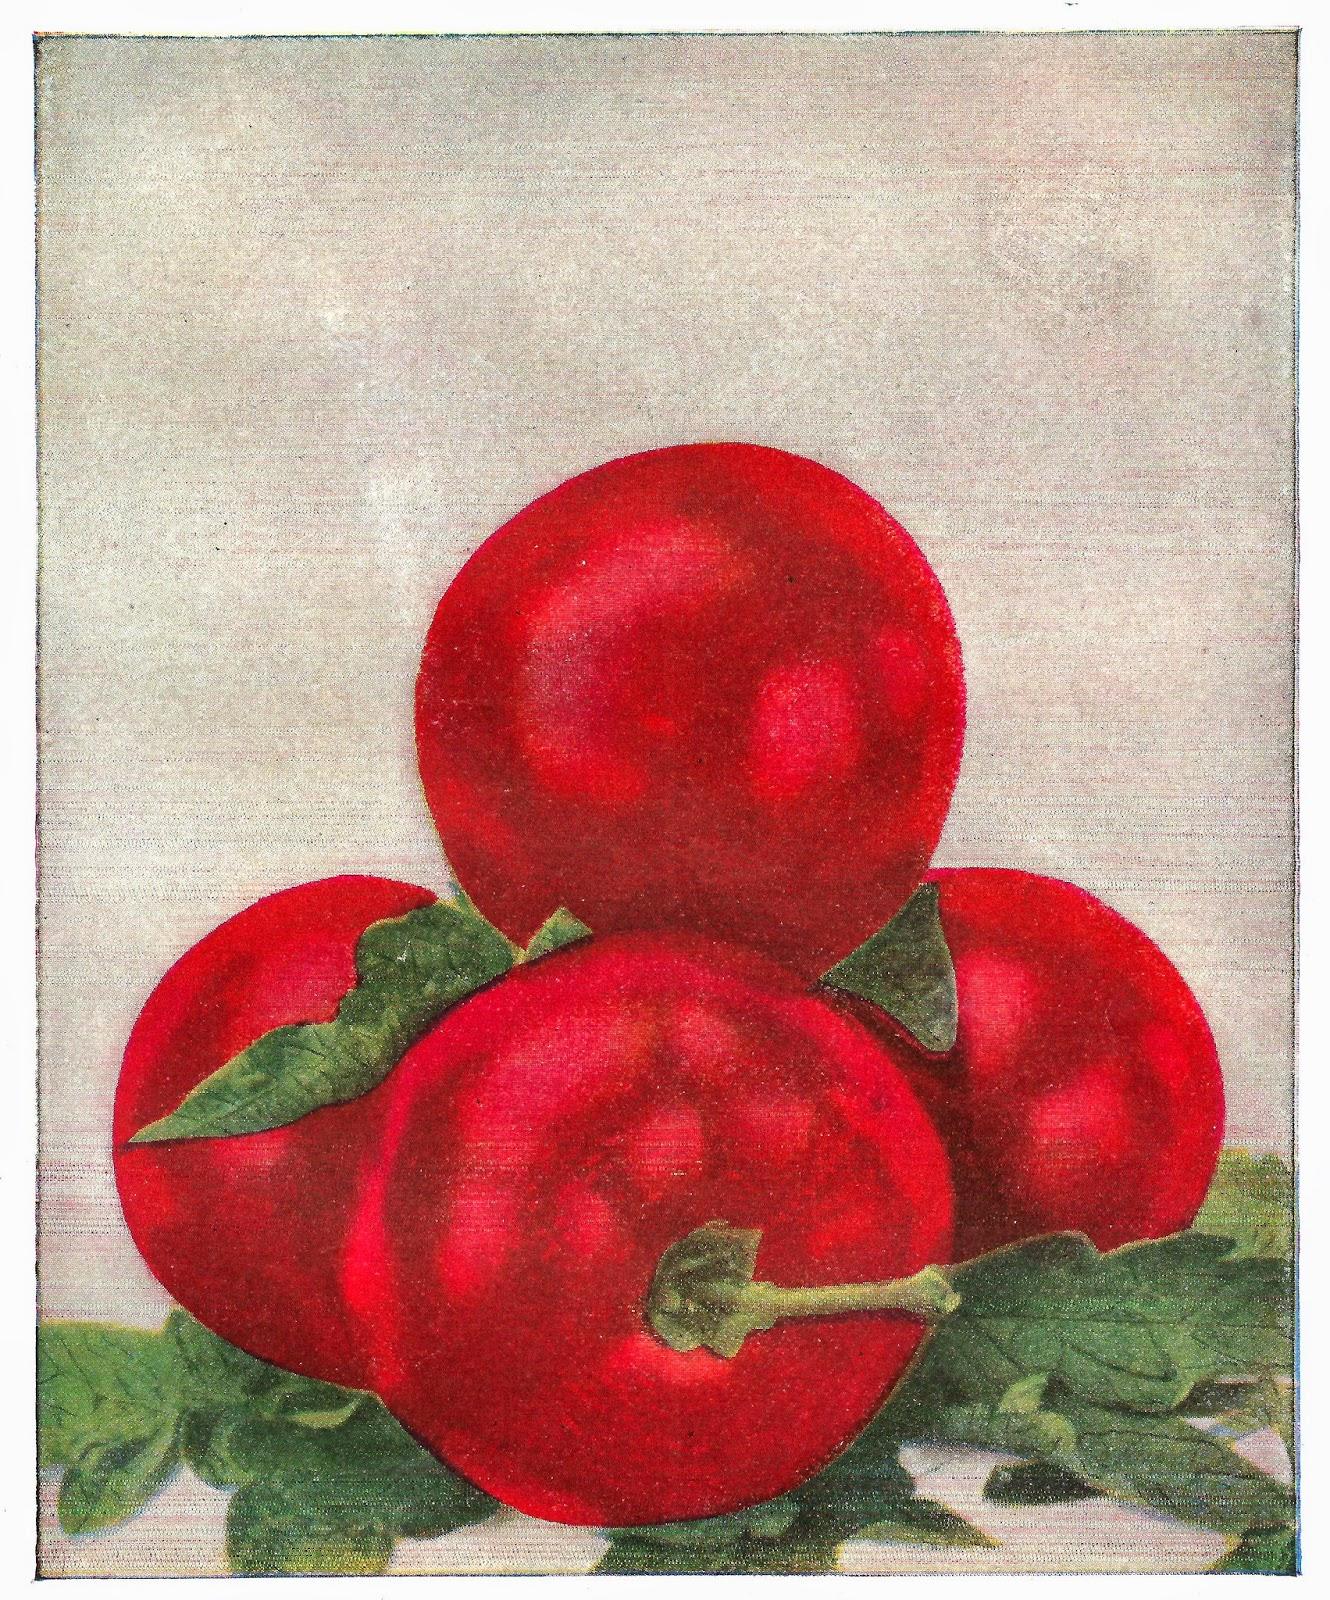 http://4.bp.blogspot.com/-QfCmYaKenq4/U4Ugl3Pd8oI/AAAAAAAAUC8/Oo7ydO42kQA/s1600/tomato_3.jpg